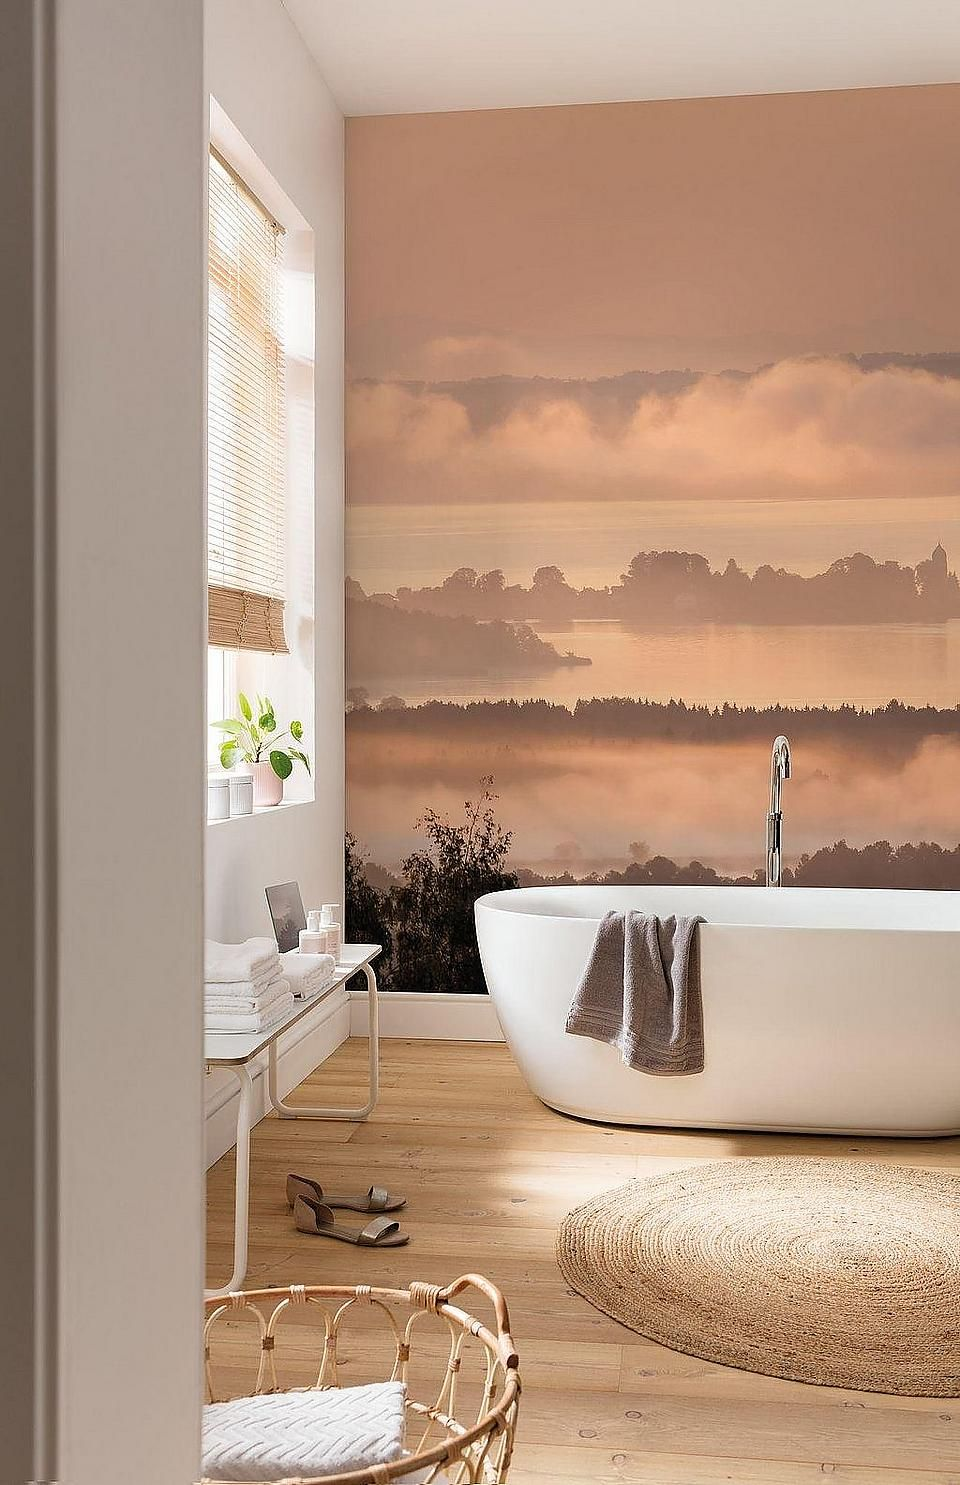 Komar Vlies Fototapete Chiemsee Baur Tapete Wandgestaltung Buntetapeten Einrichtungsideen Tapeten Fototapete Zimmereinrichtung